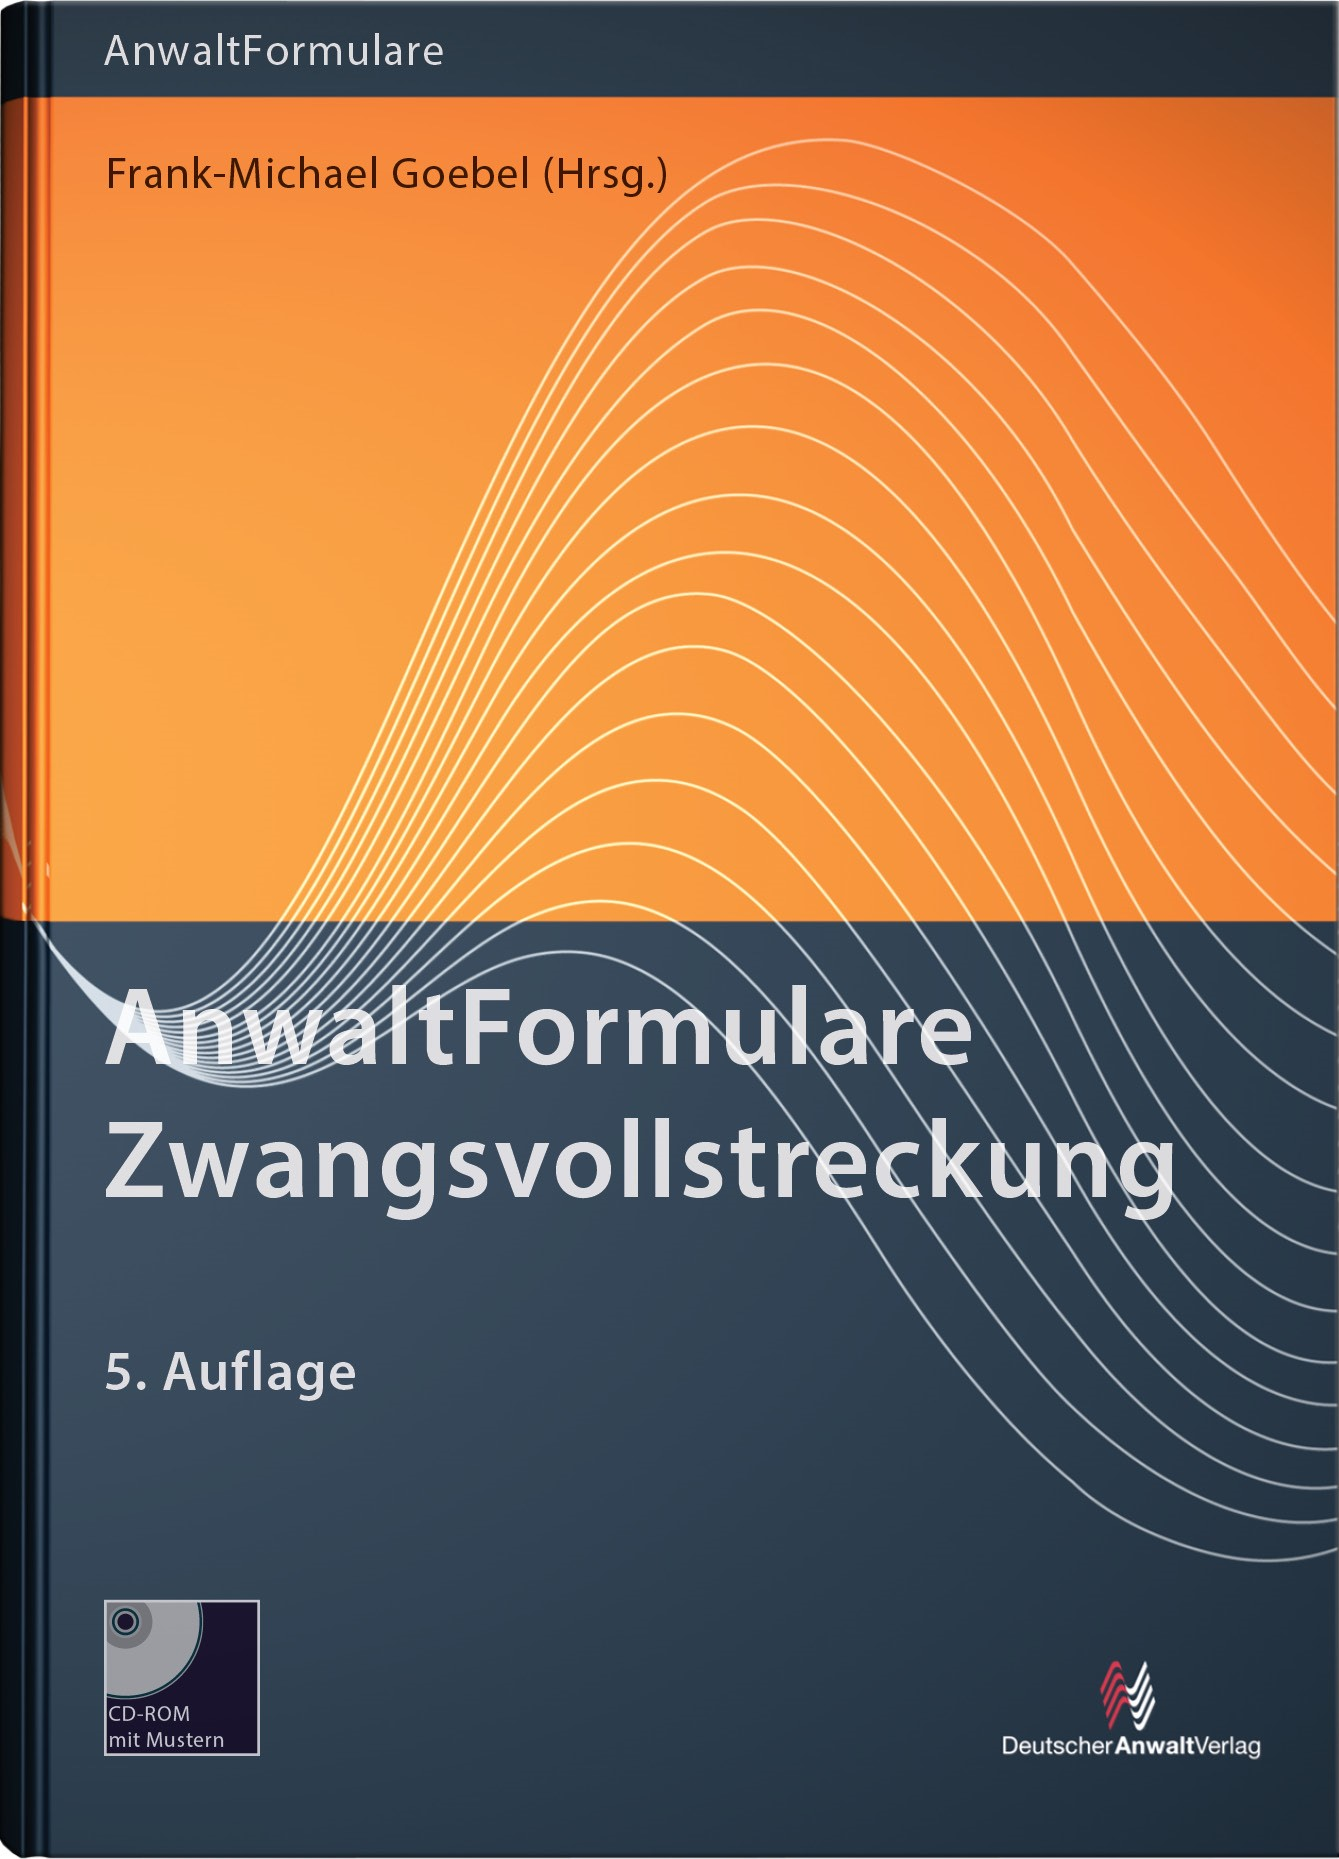 AnwaltFormulare Zwangsvollstreckung | Goebel (Hrsg.) | 5. Auflage, 2015 (Cover)